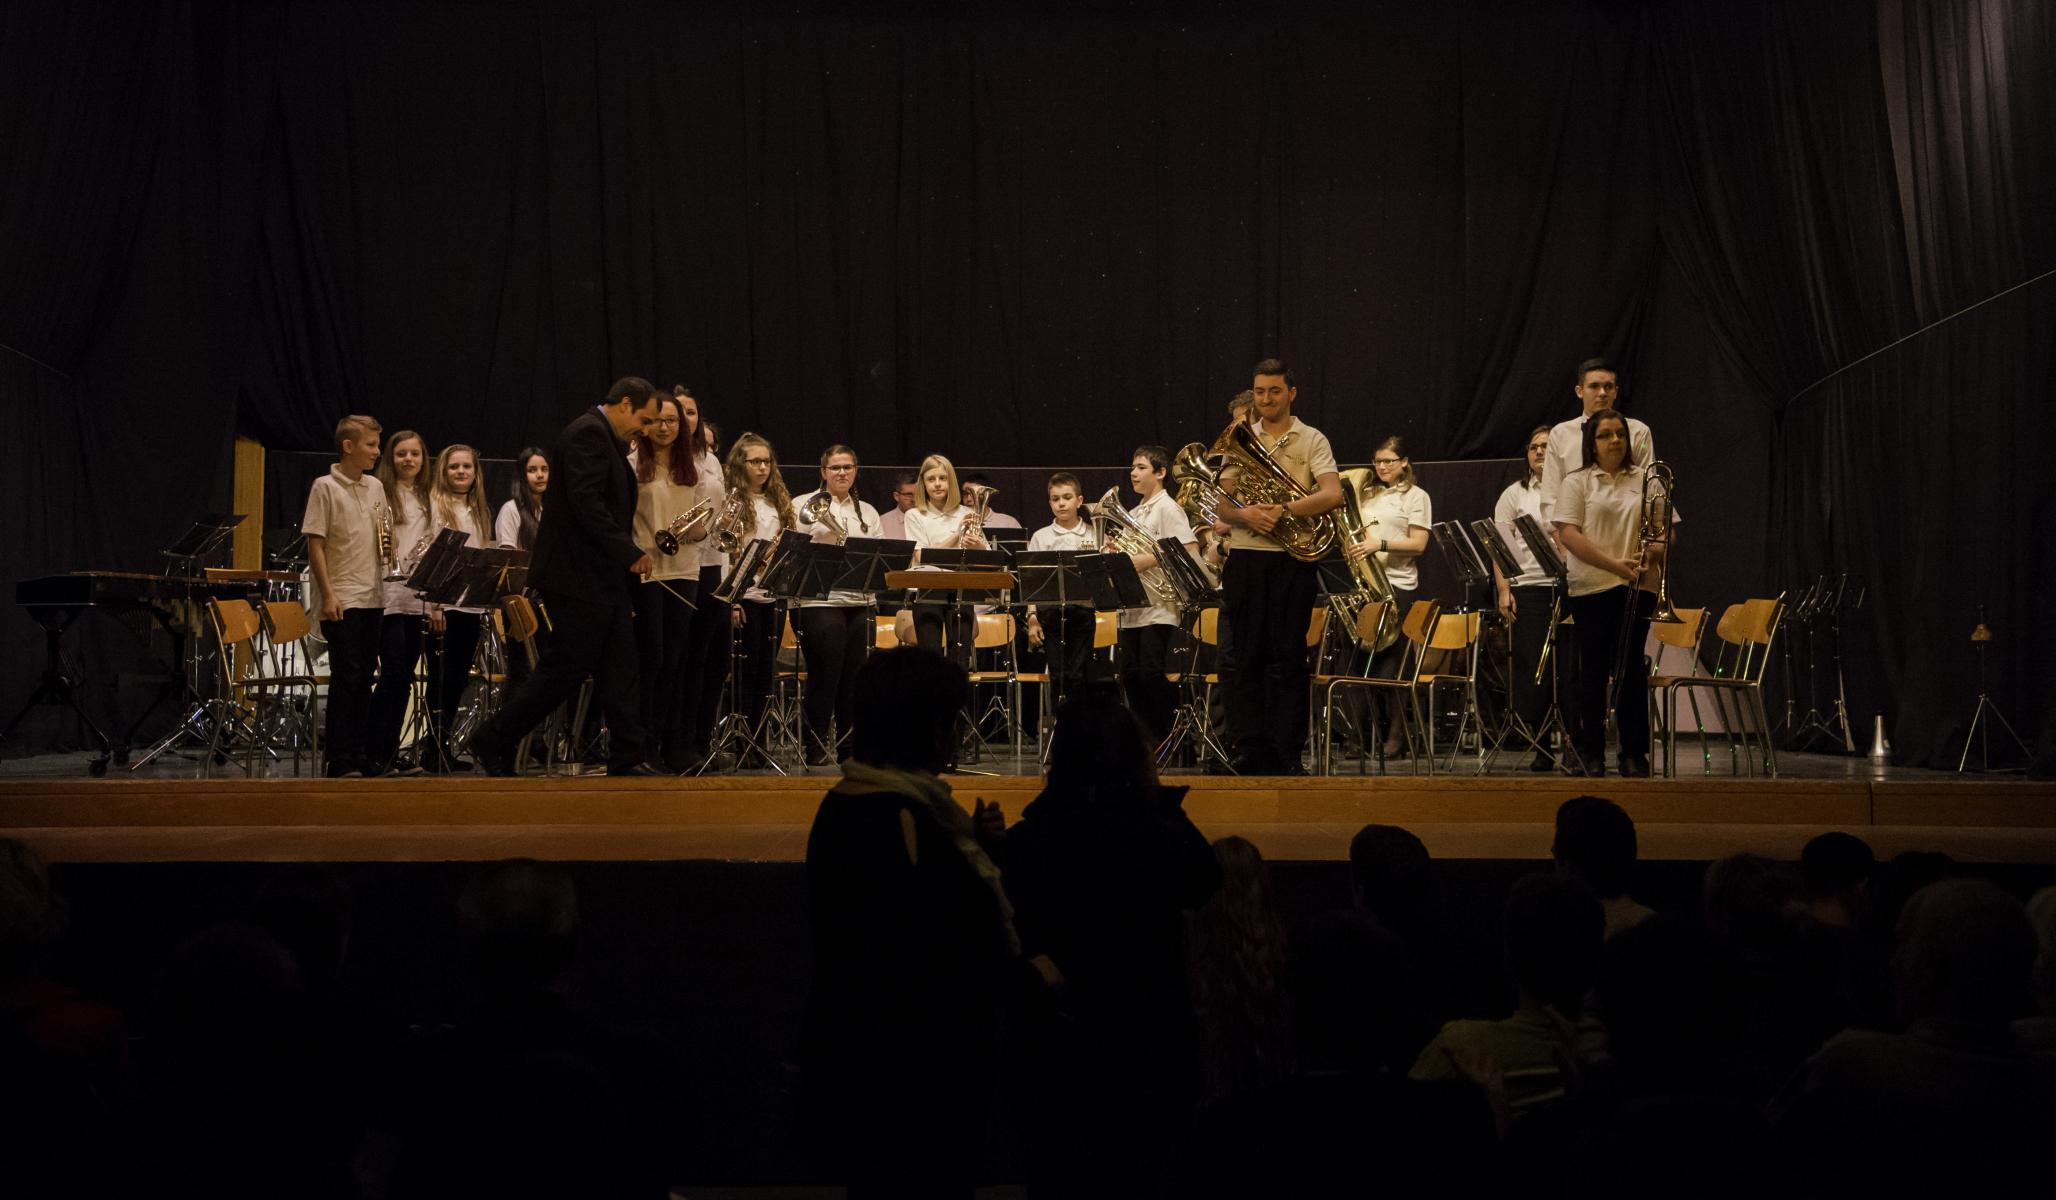 170211_concert_annuel17-008